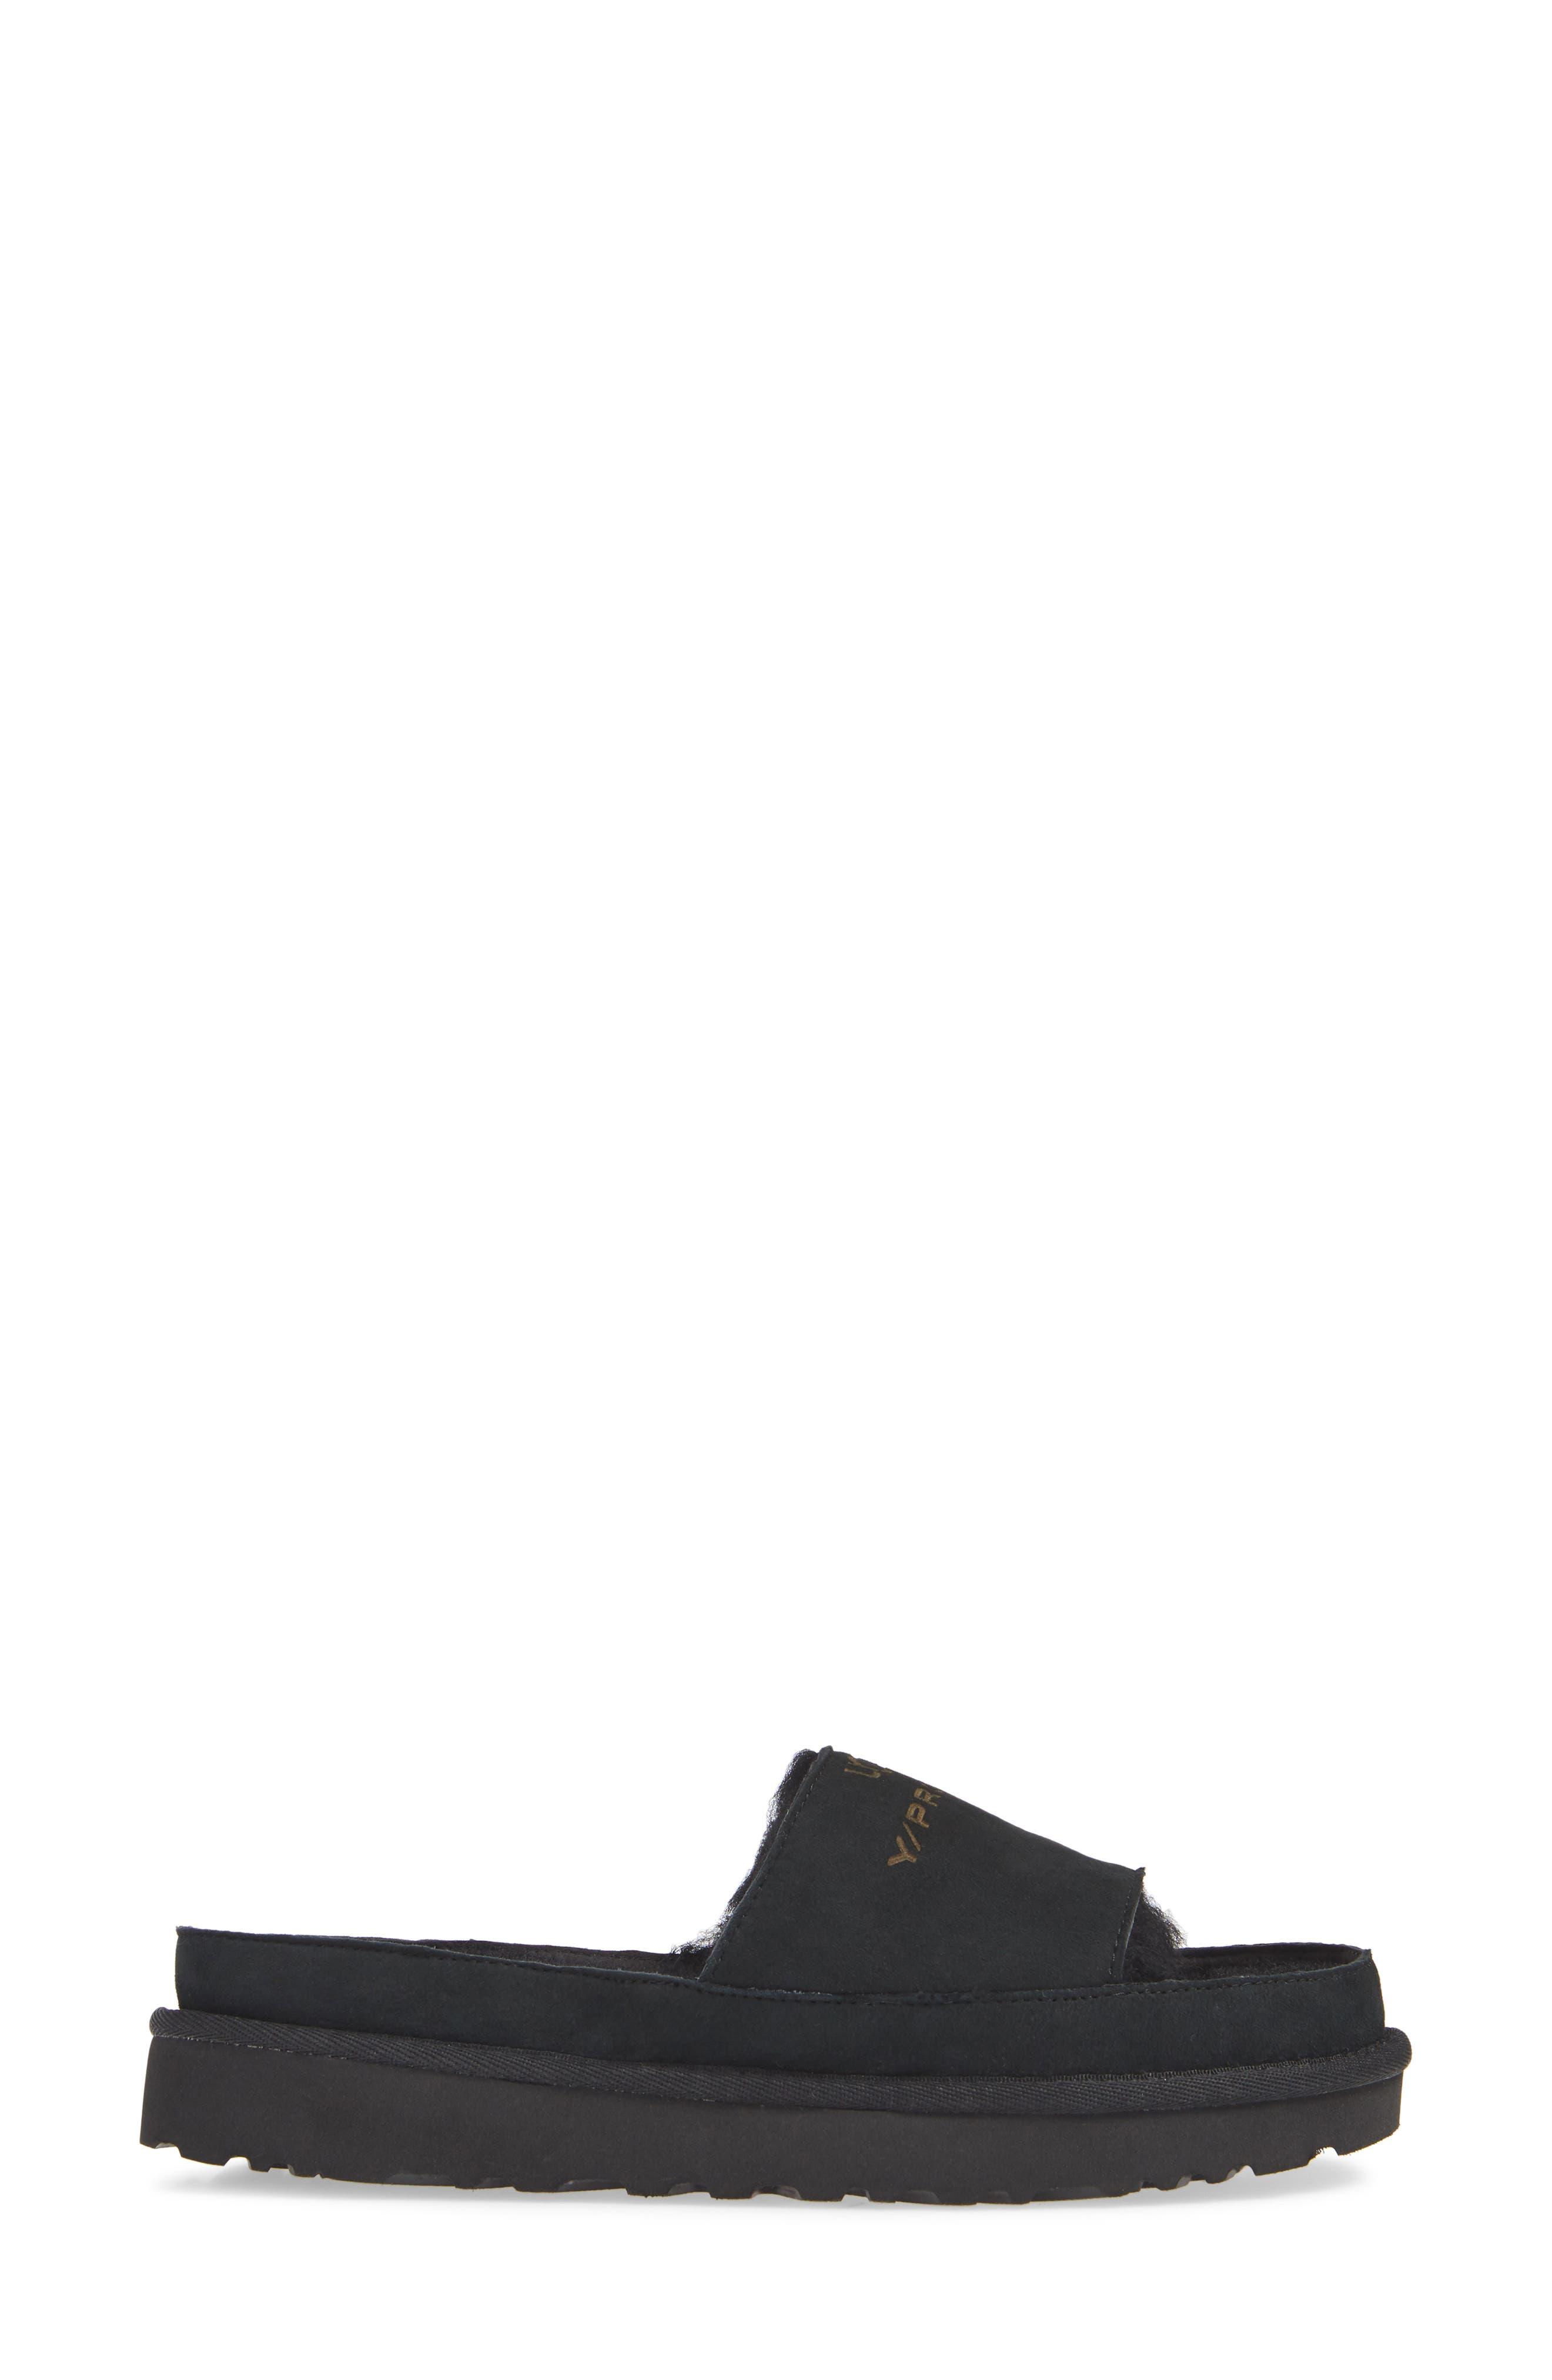 x UGG<sup>®</sup> Genuine Shearling Slide Sandal,                             Alternate thumbnail 3, color,                             001